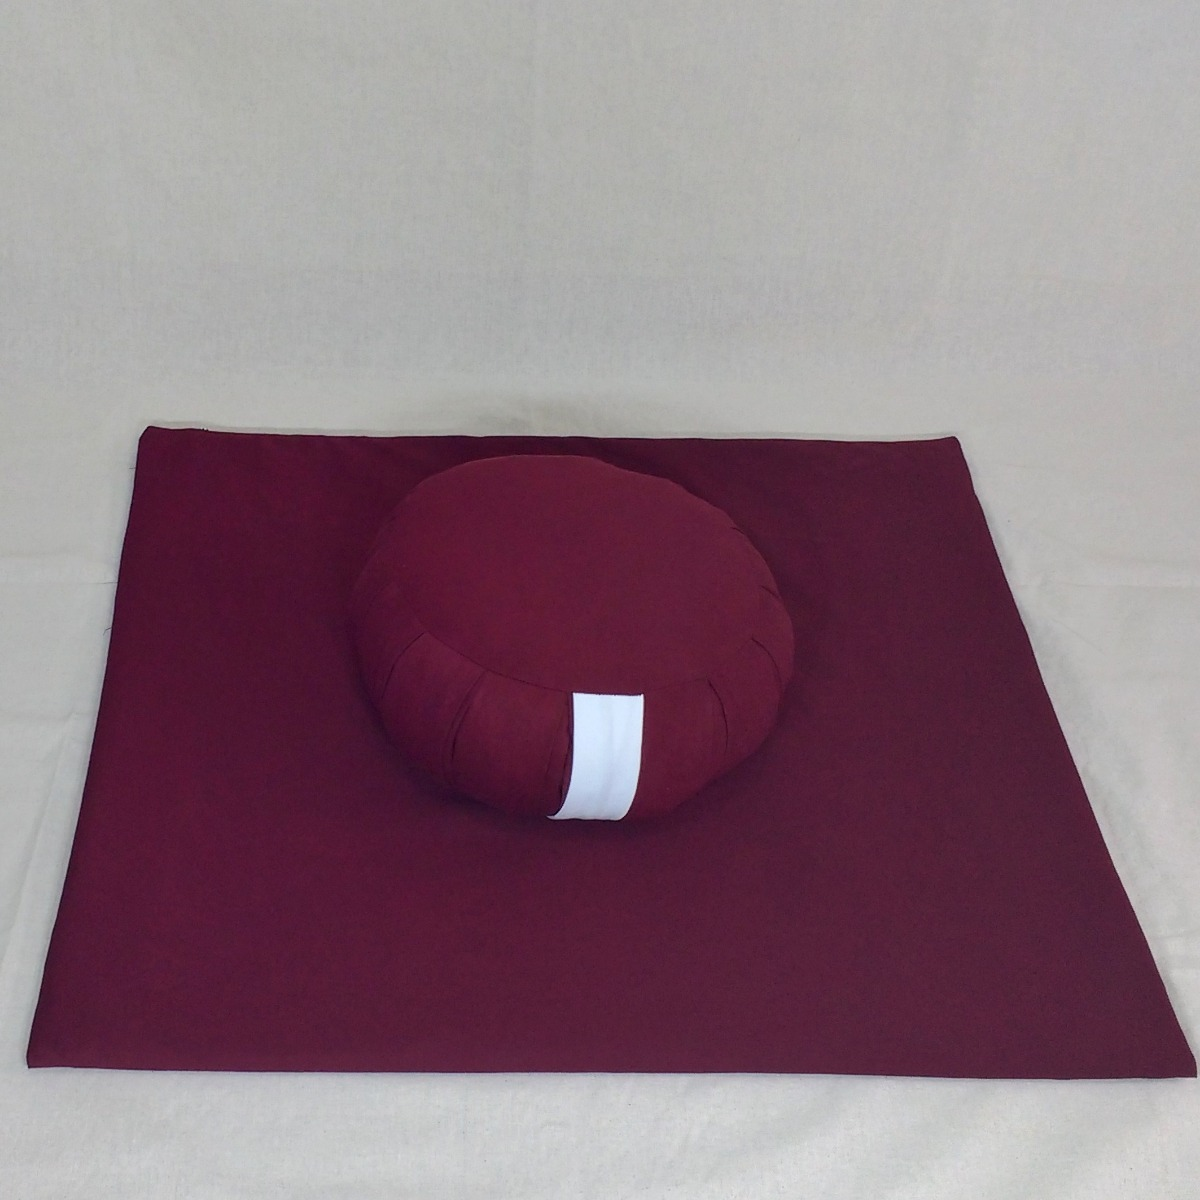 zafu zabuton almofadas de meditação zazen bordô tibetano r